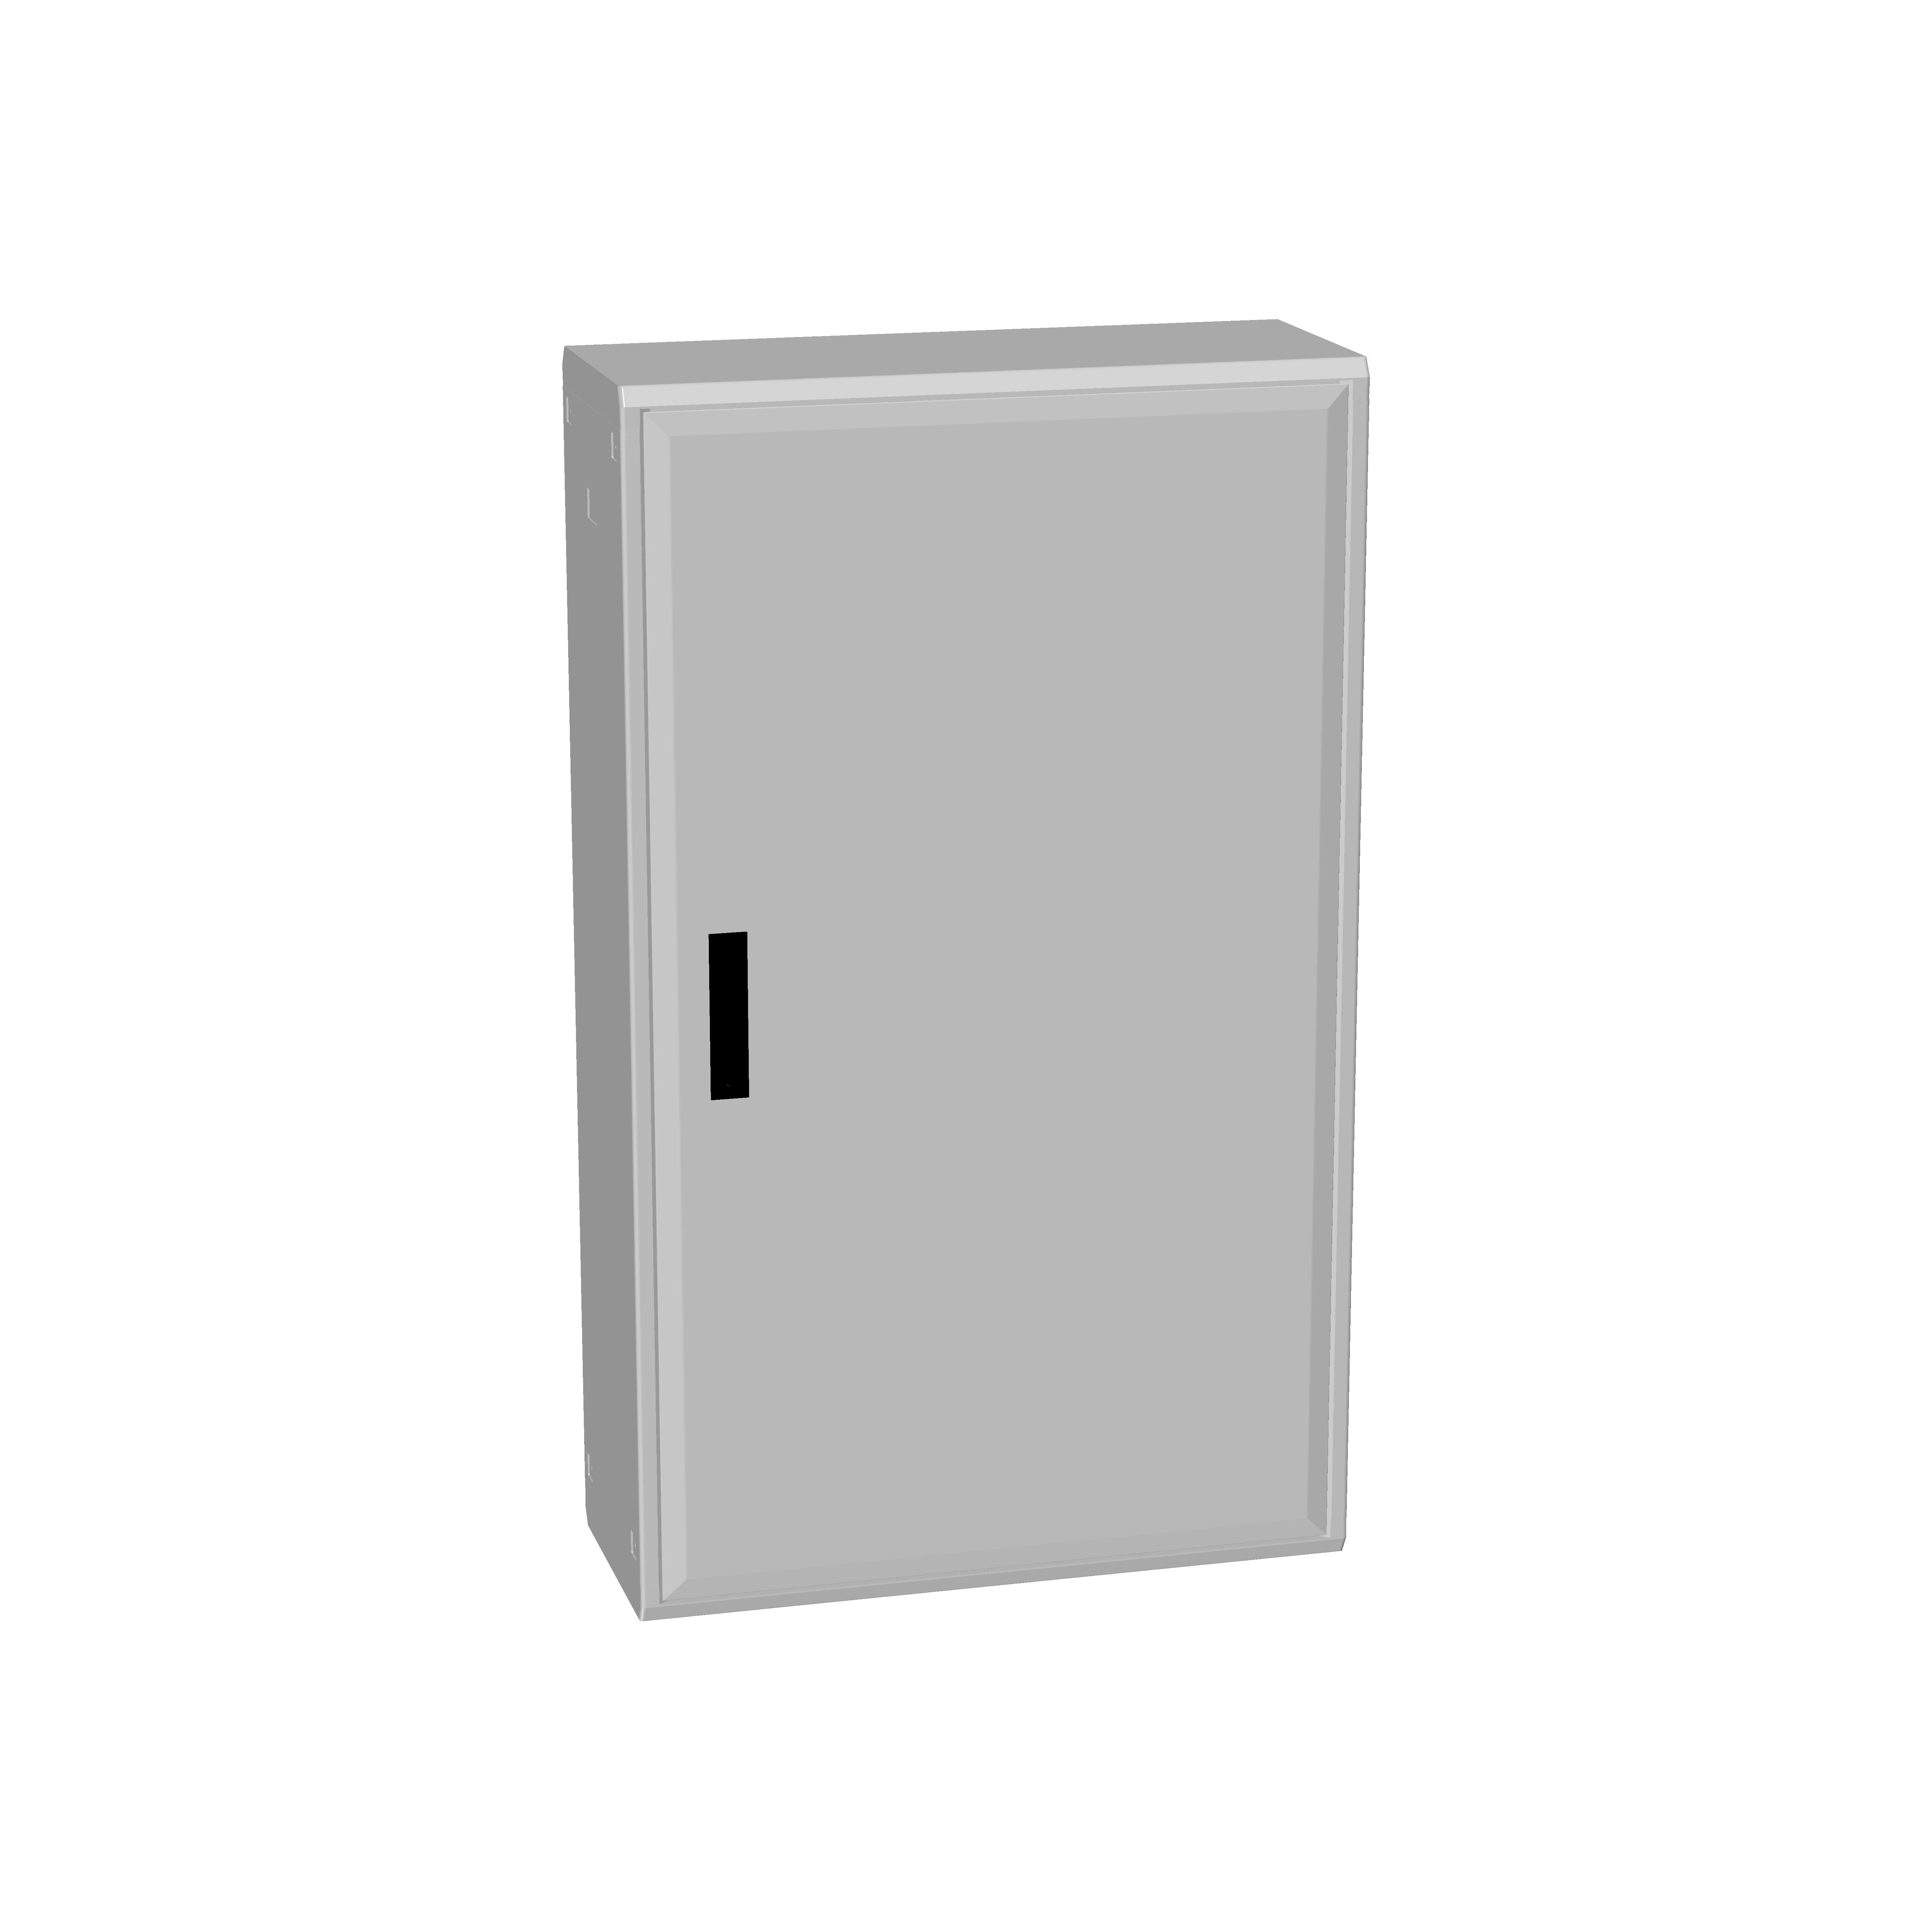 1 Stk Polyesterschrank, eintürig, 1250x750x312 POCC5330--